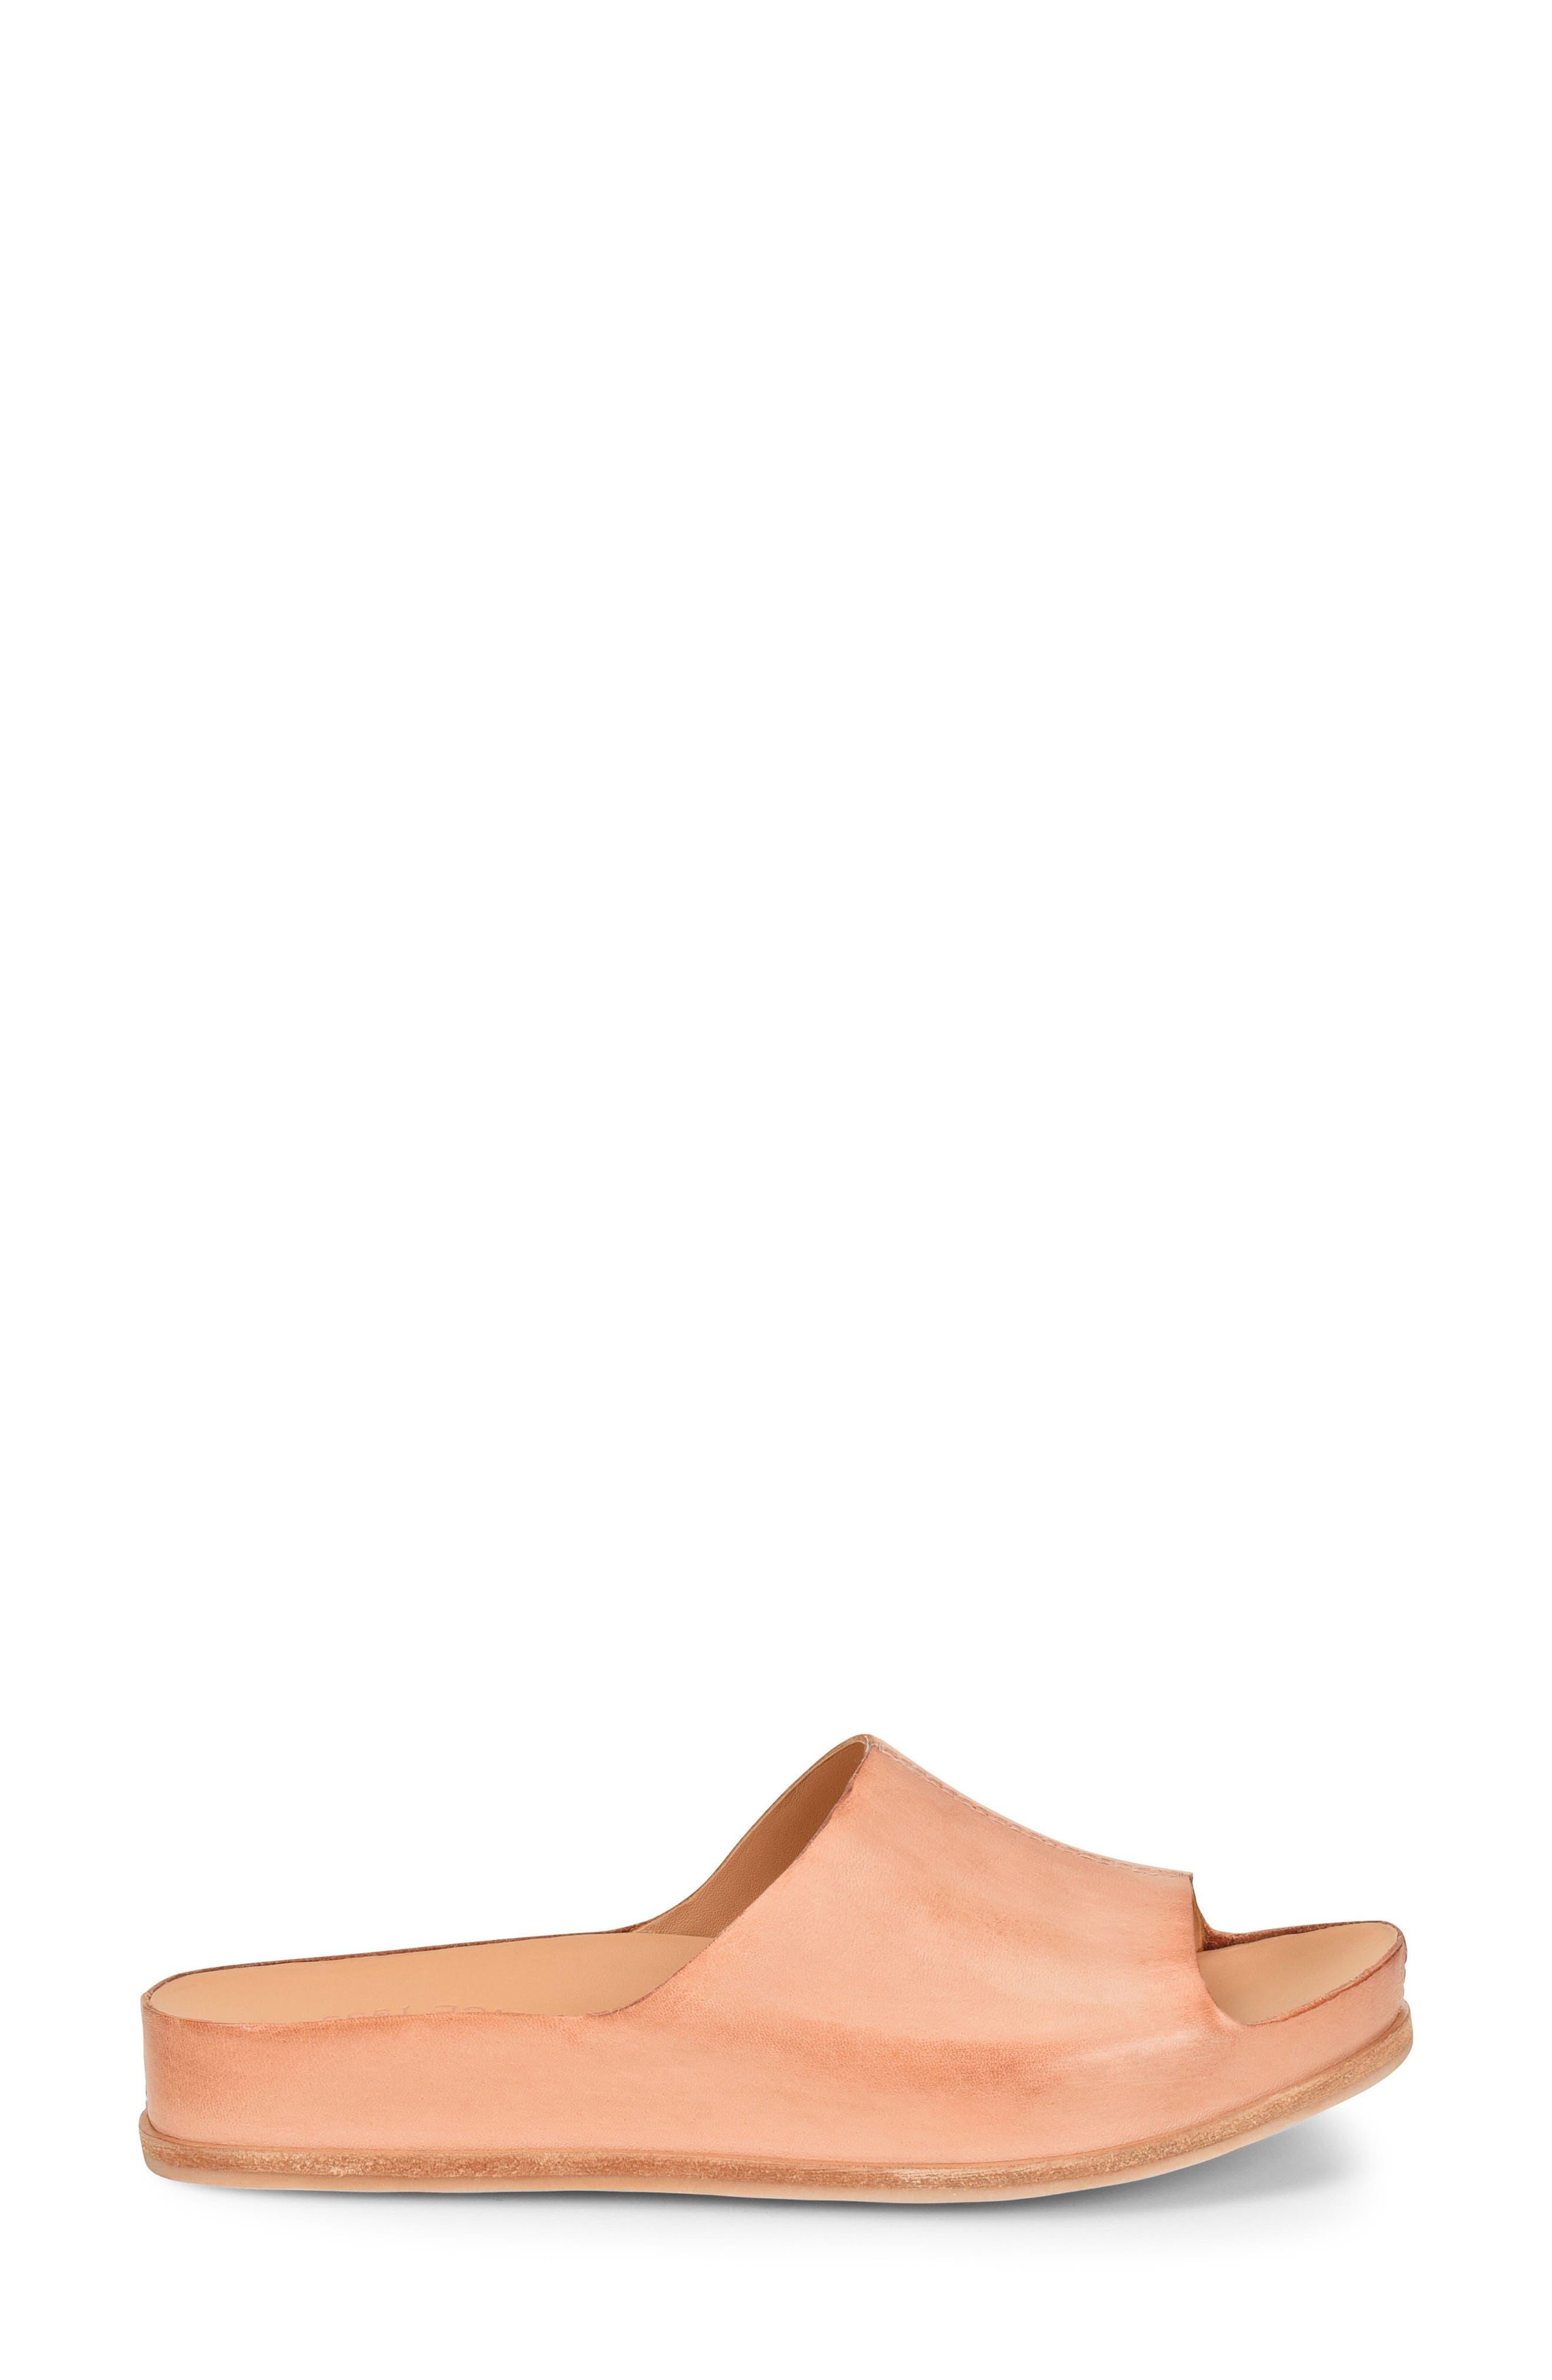 'Tutsi' Slide Sandal,                             Alternate thumbnail 3, color,                             Blush Leather